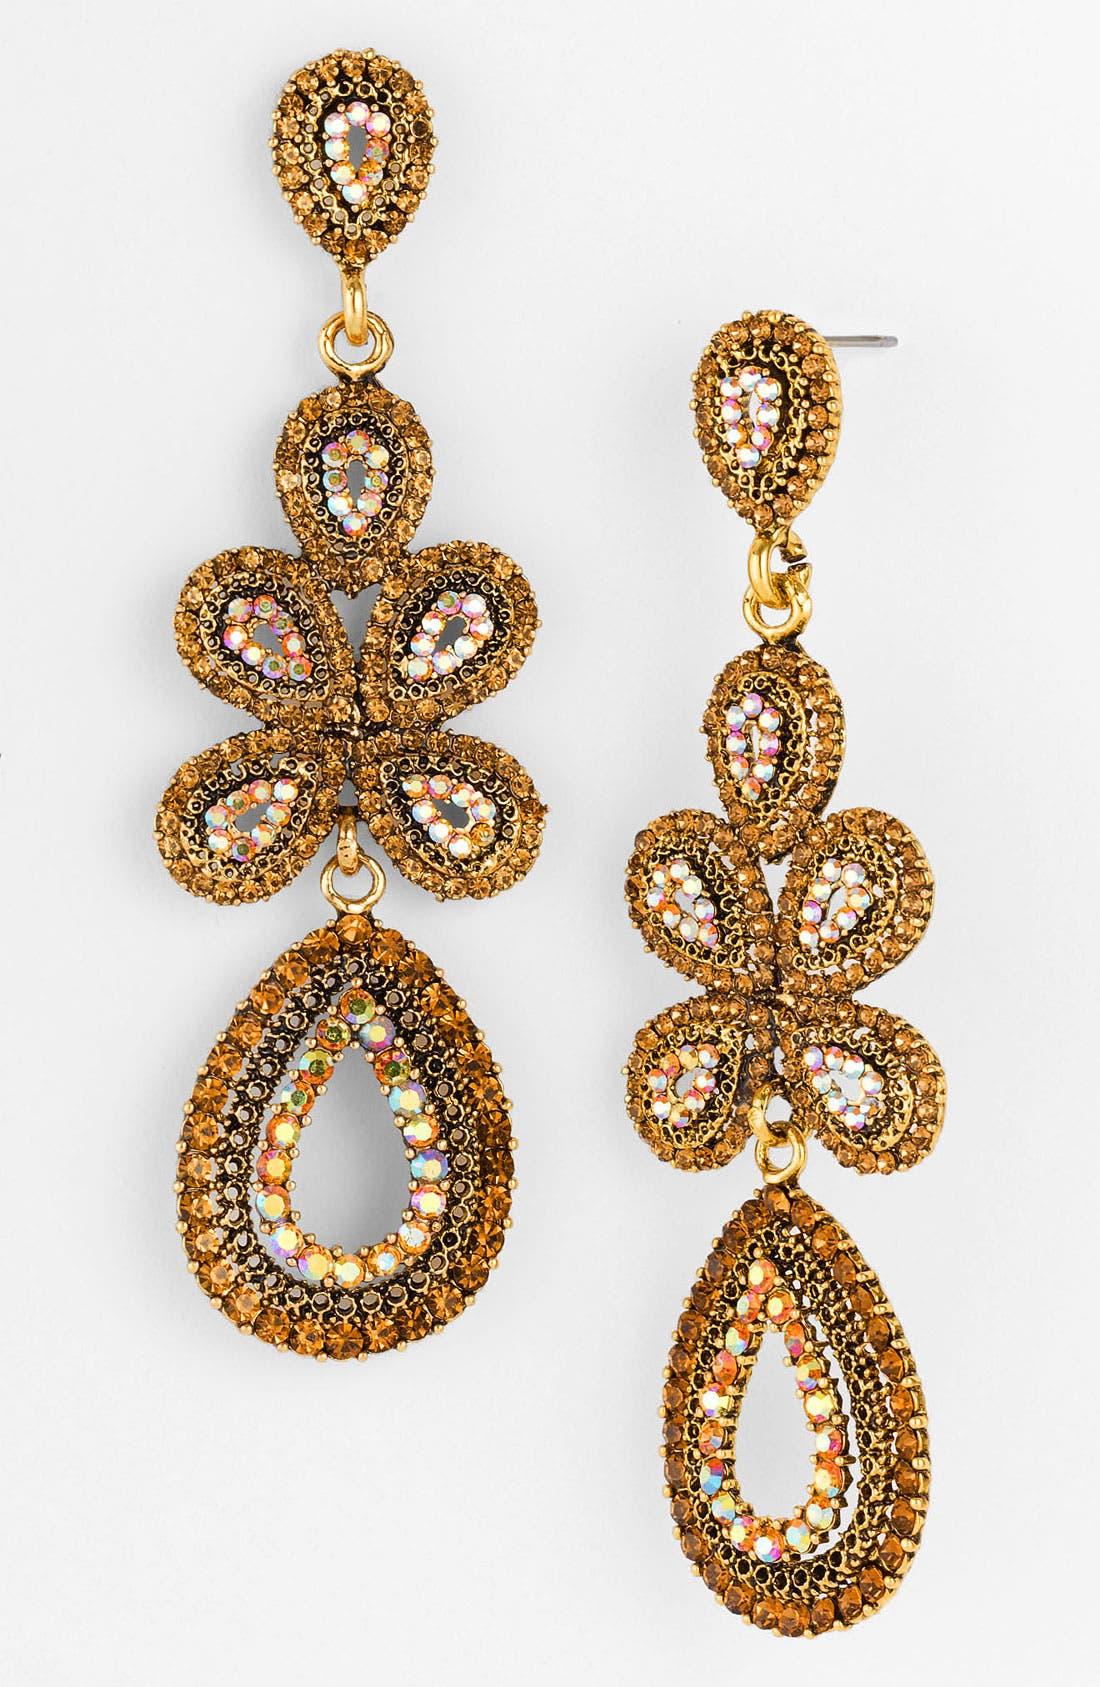 'Ornate' Linear Statement Earrings,                             Main thumbnail 7, color,